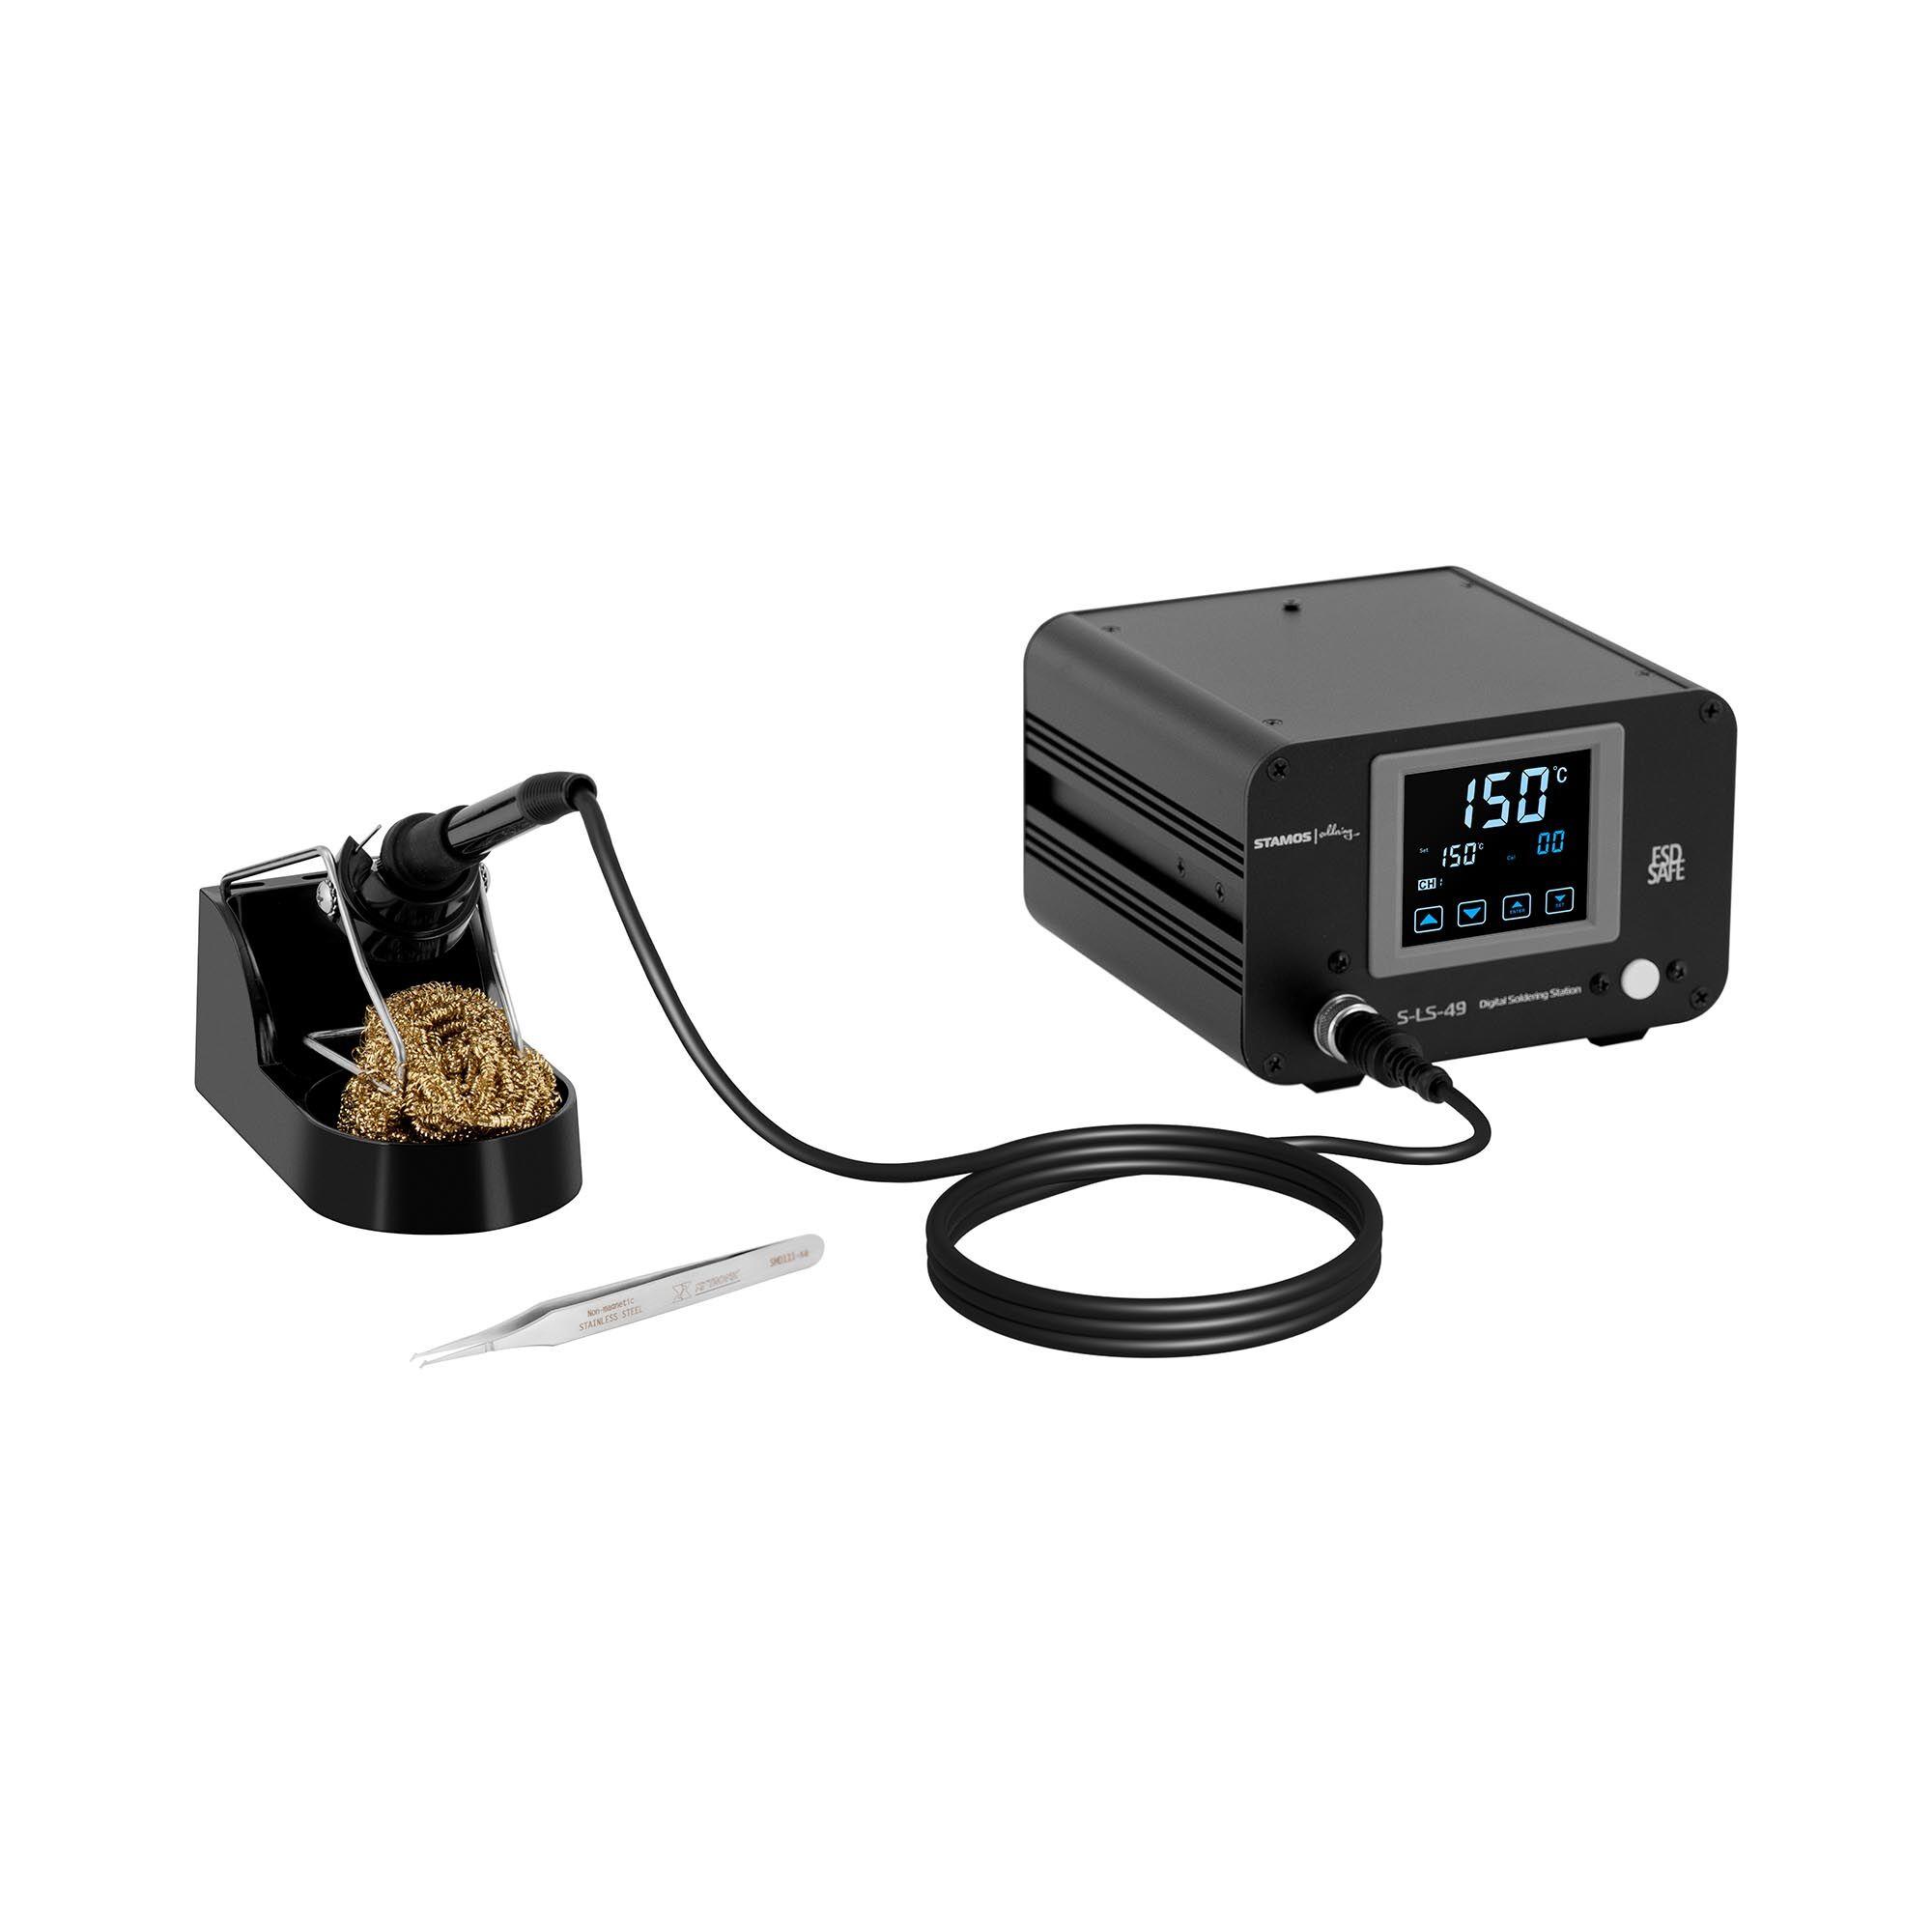 Stamos Soldering Loddestation - digital - 100 W - LCD-touch S-LS-49